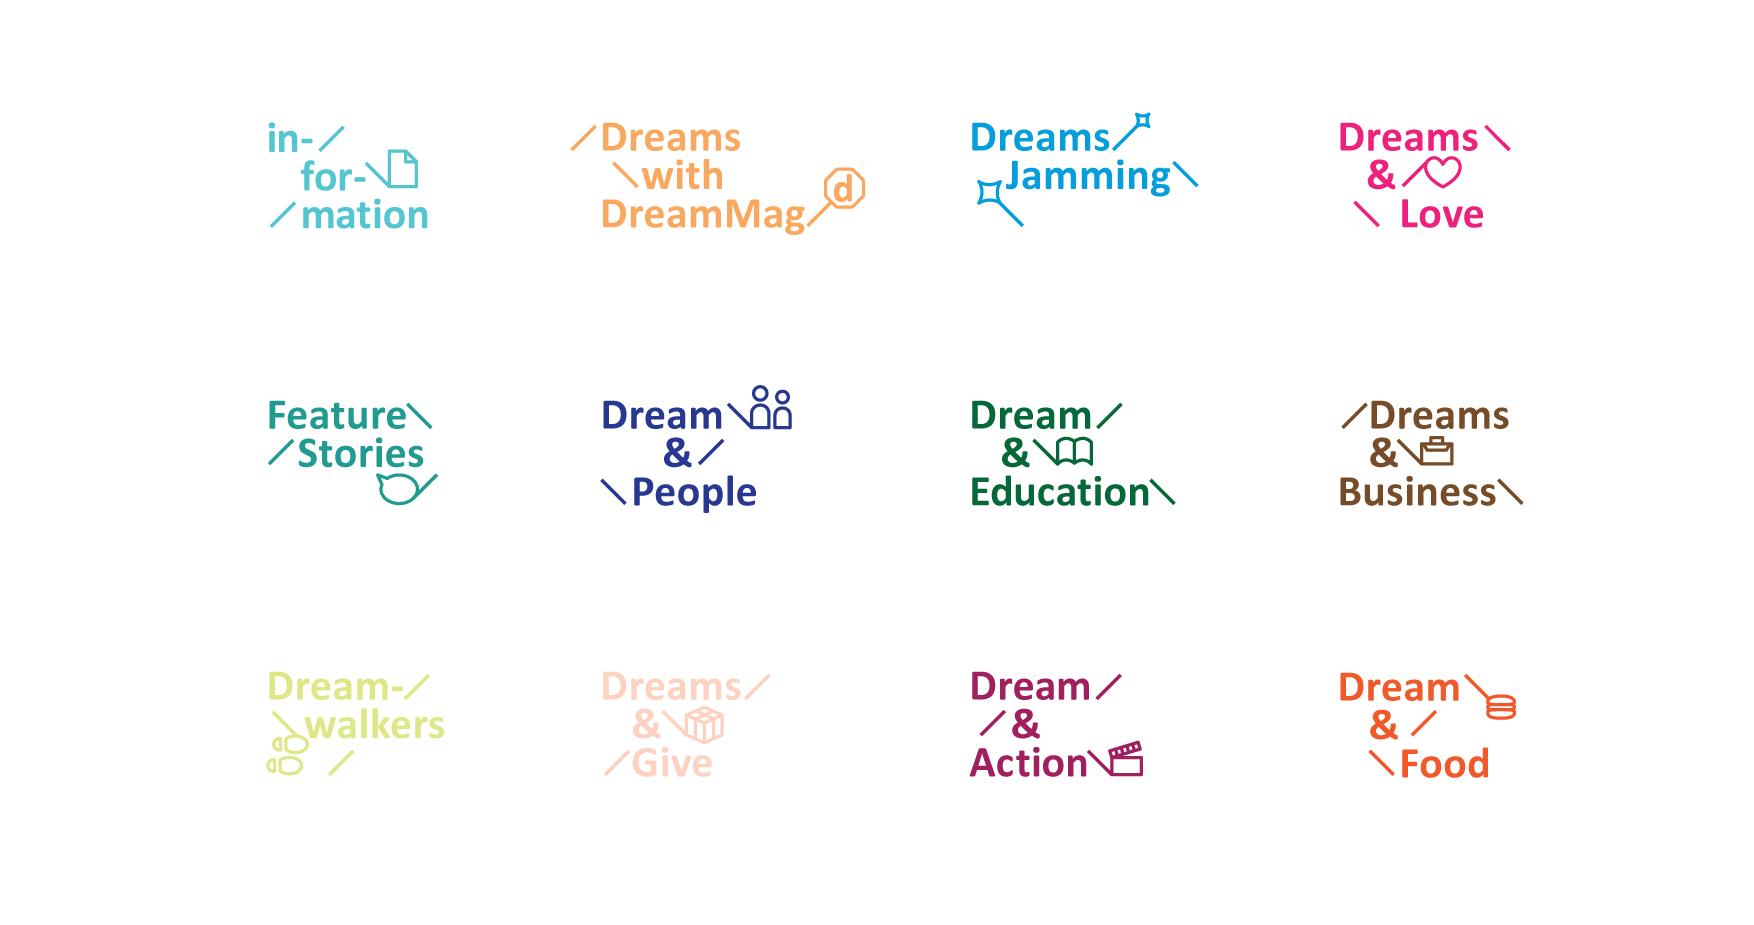 DreamMag_identity-03.jpg